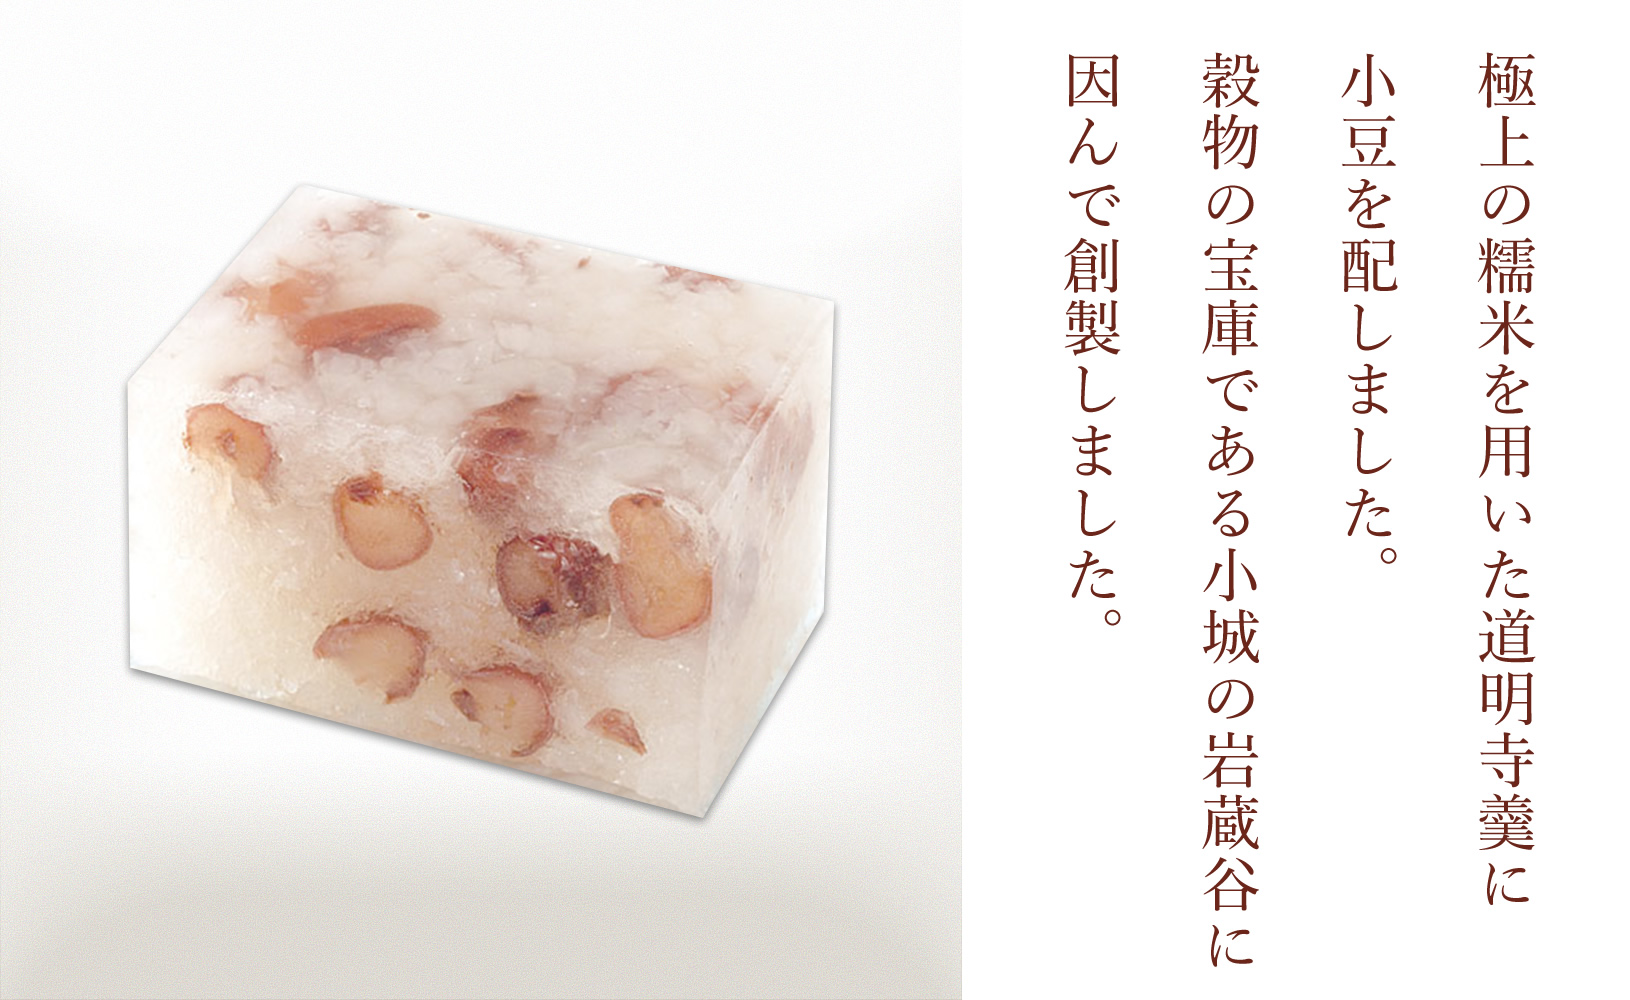 【八月】岩蔵